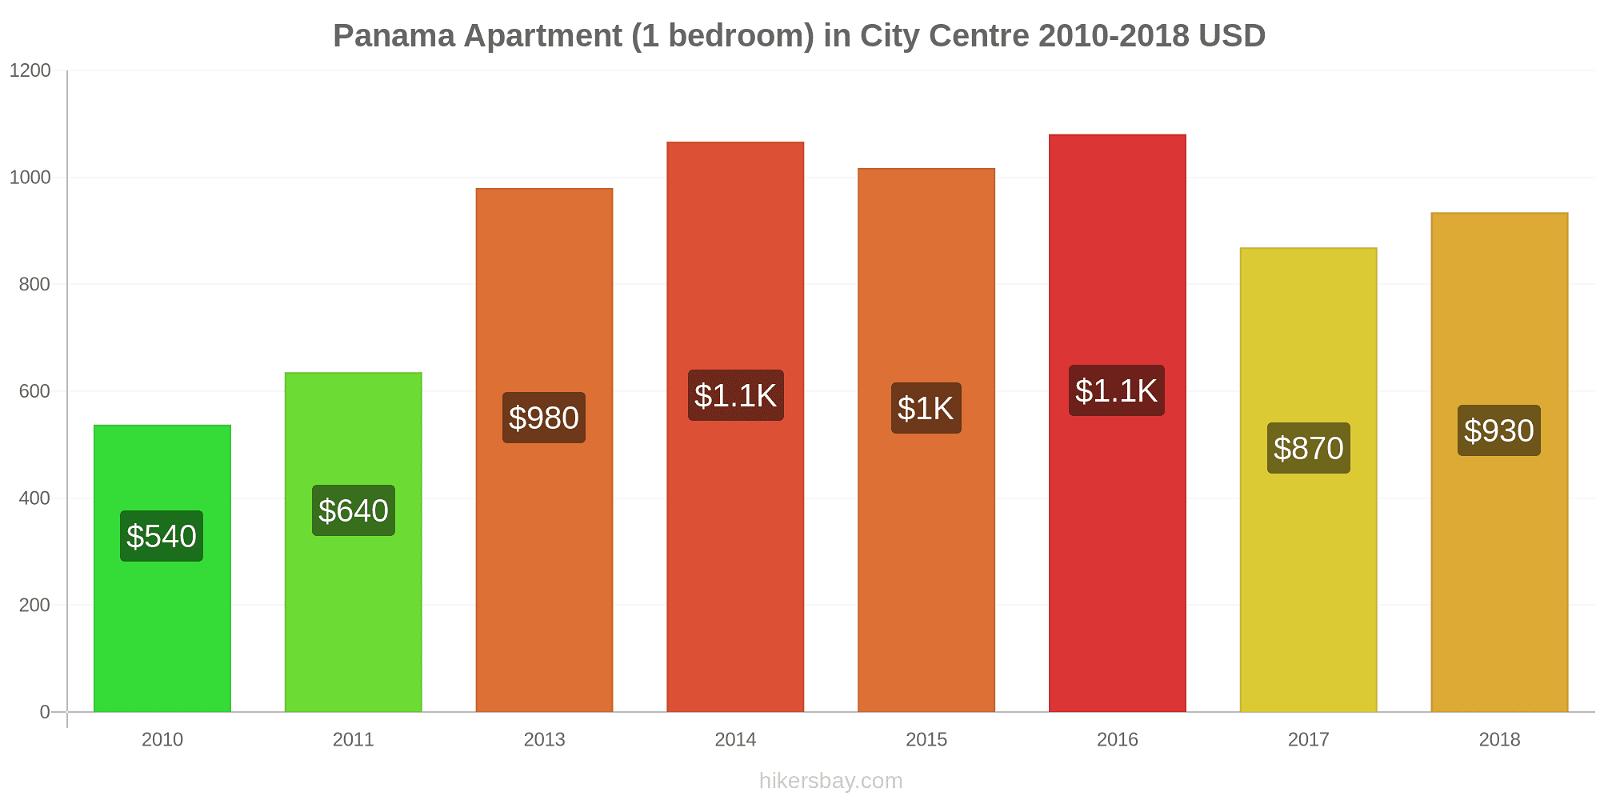 Panama price changes Apartment (1 bedroom) in City Centre hikersbay.com